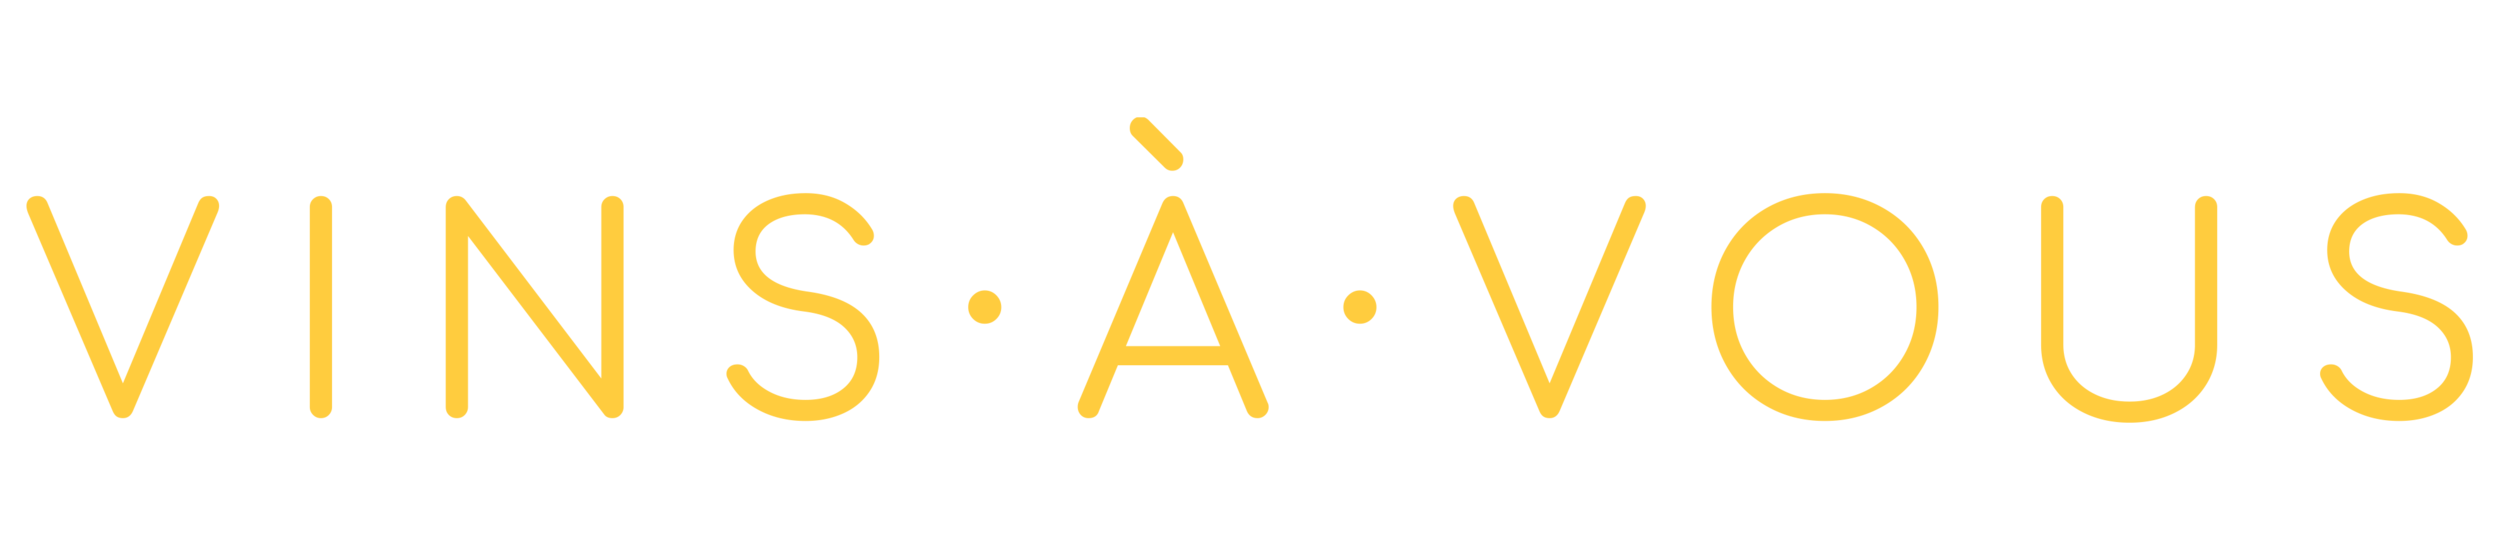 VAV_Footer_Logotype.png